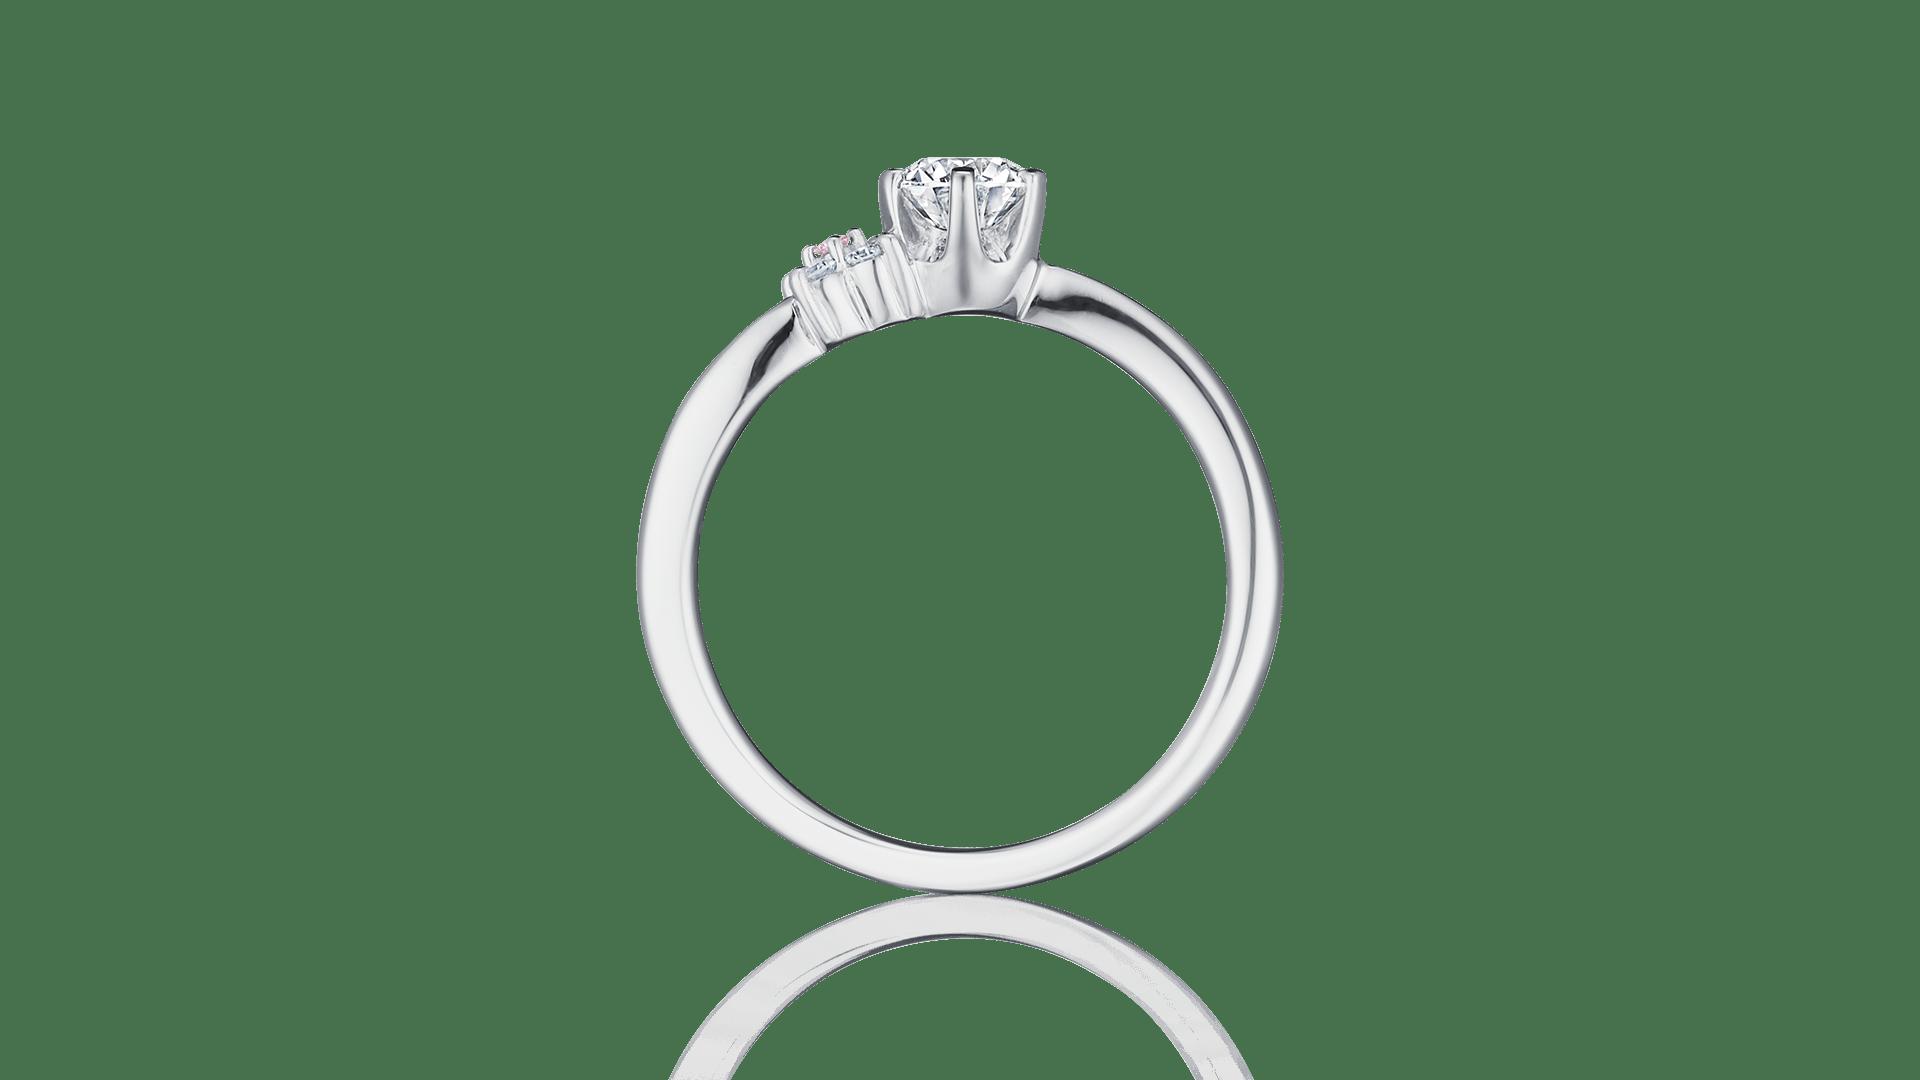 albireo アルビレオ | 婚約指輪サムネイル 2